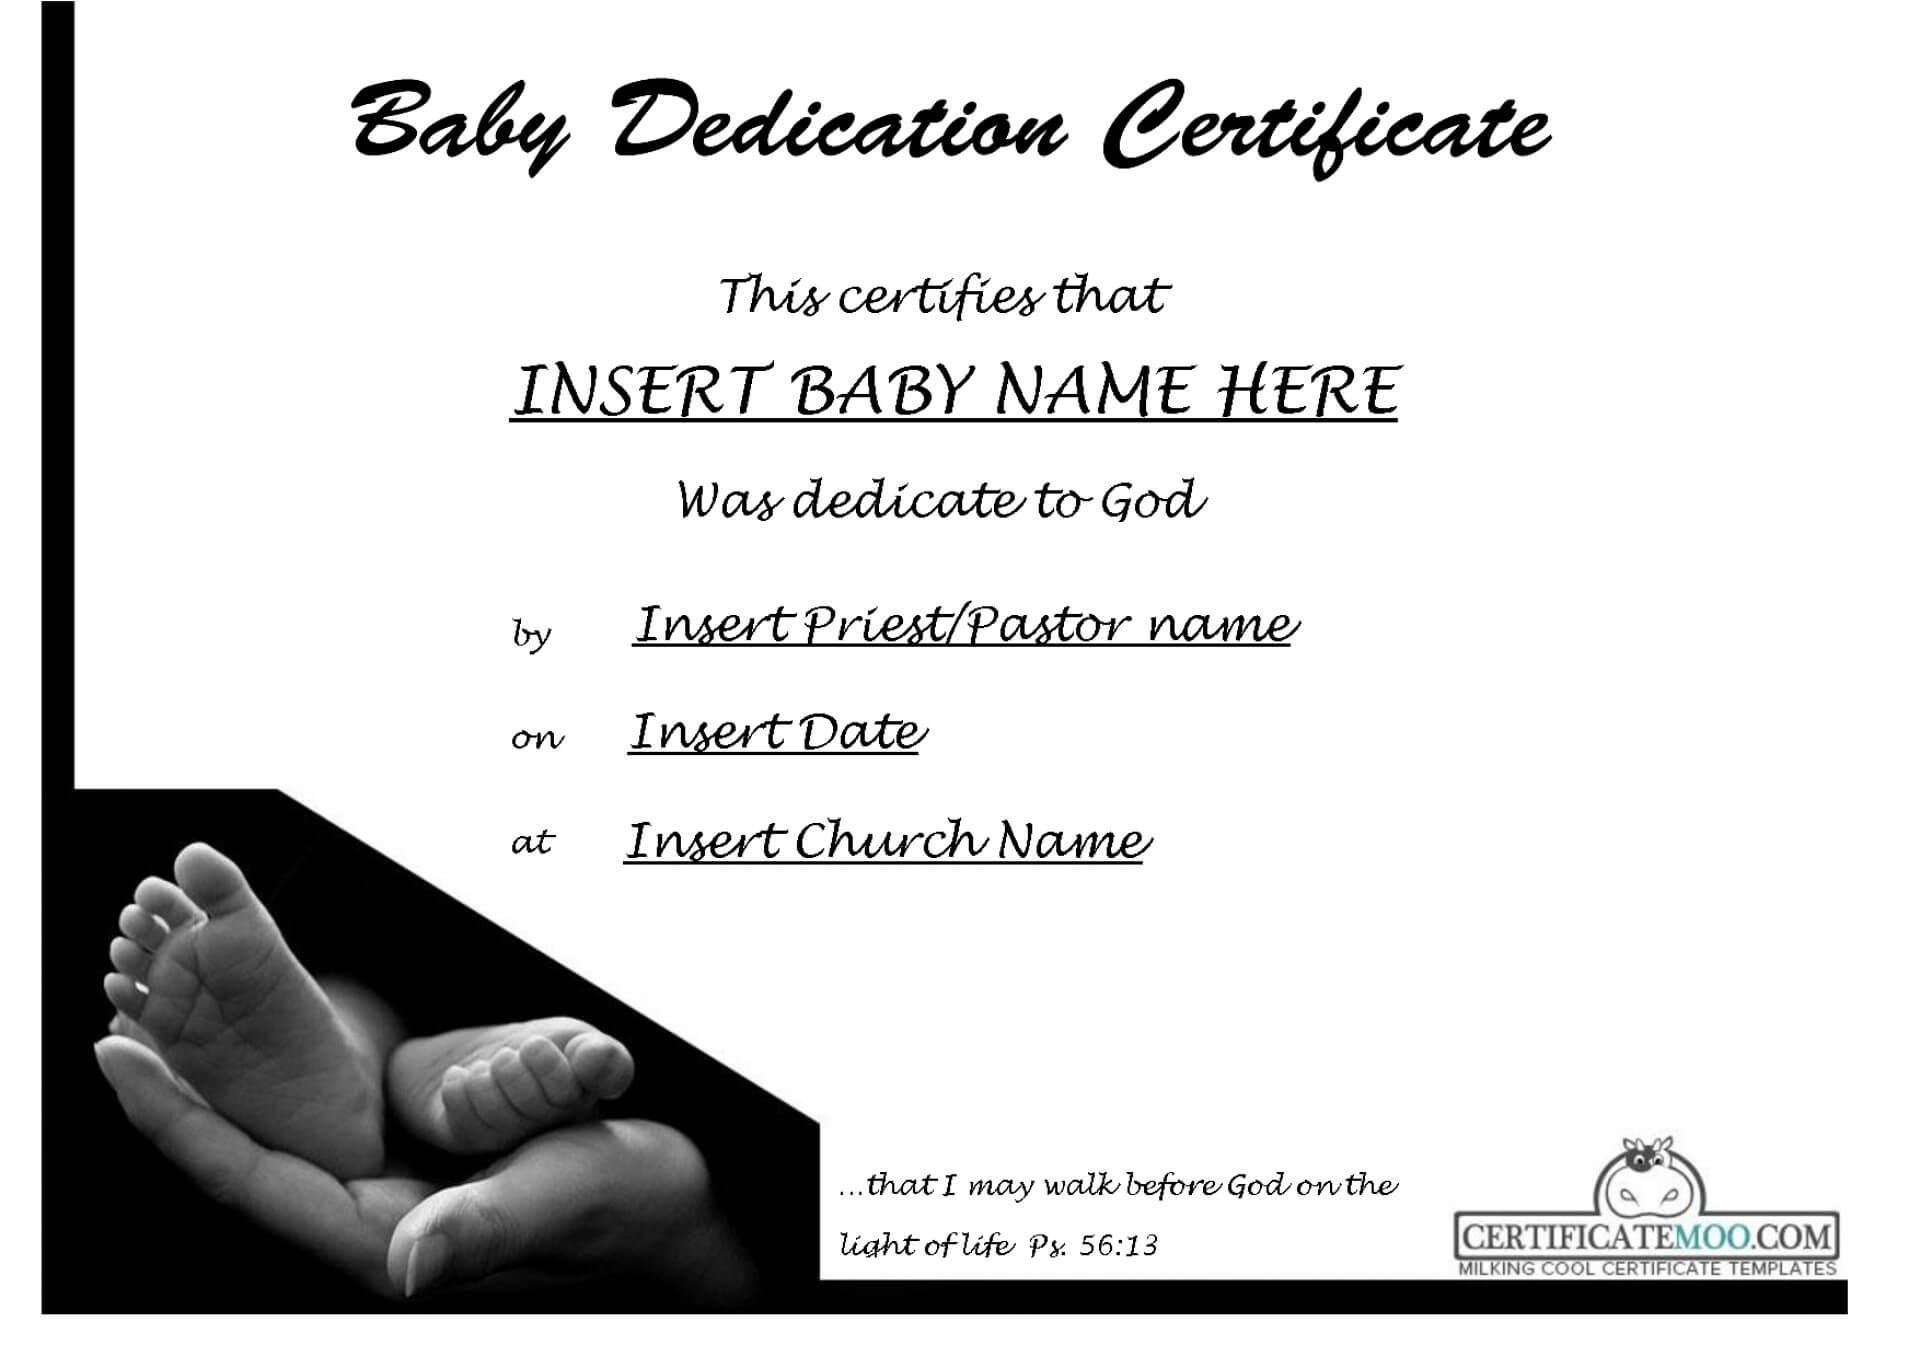 002 Baby Dedication Certificate Template Ideas Wonderful in Baby Christening Certificate Template